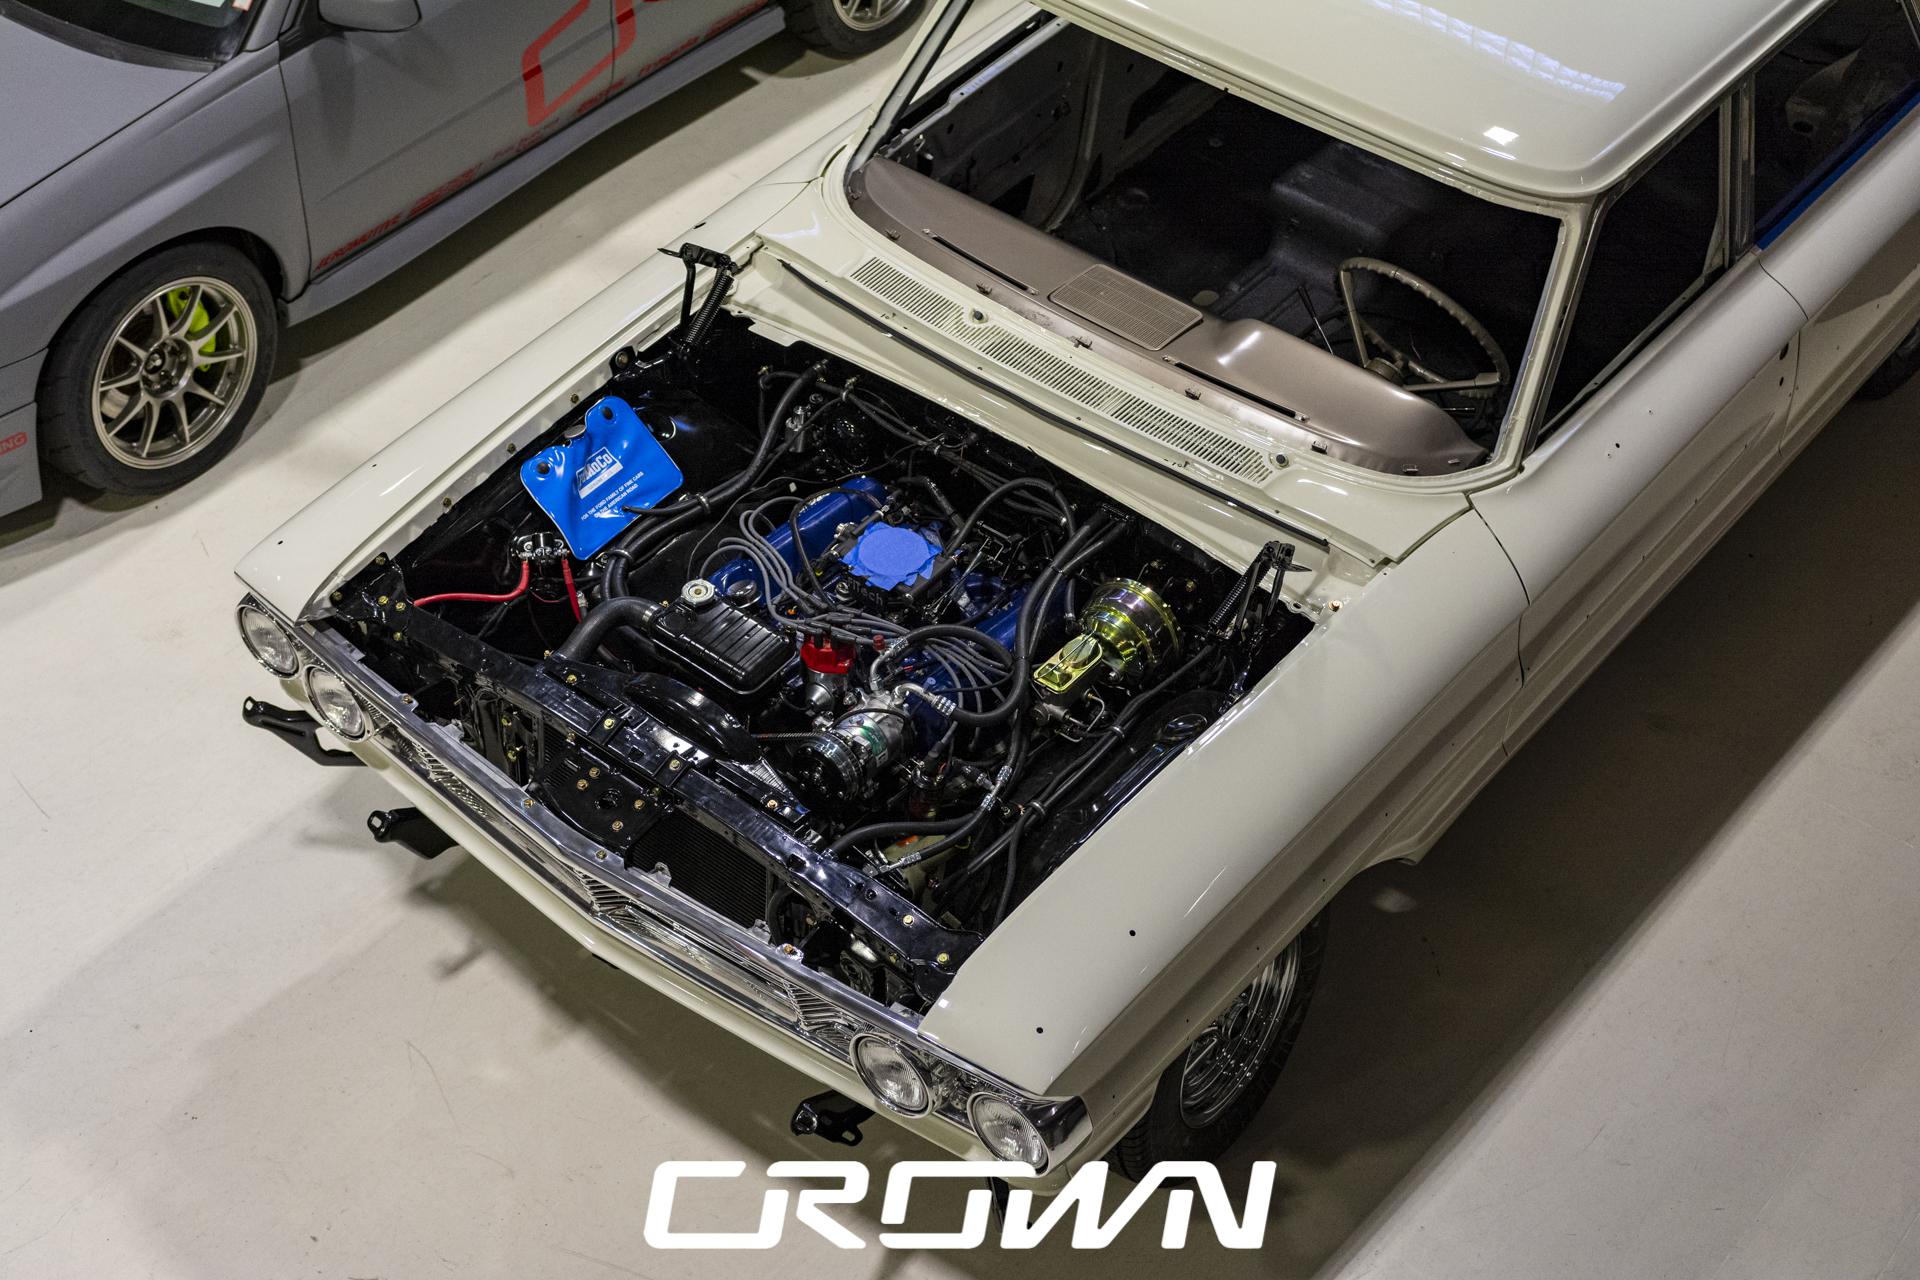 1964 Ford Country Sedan Update